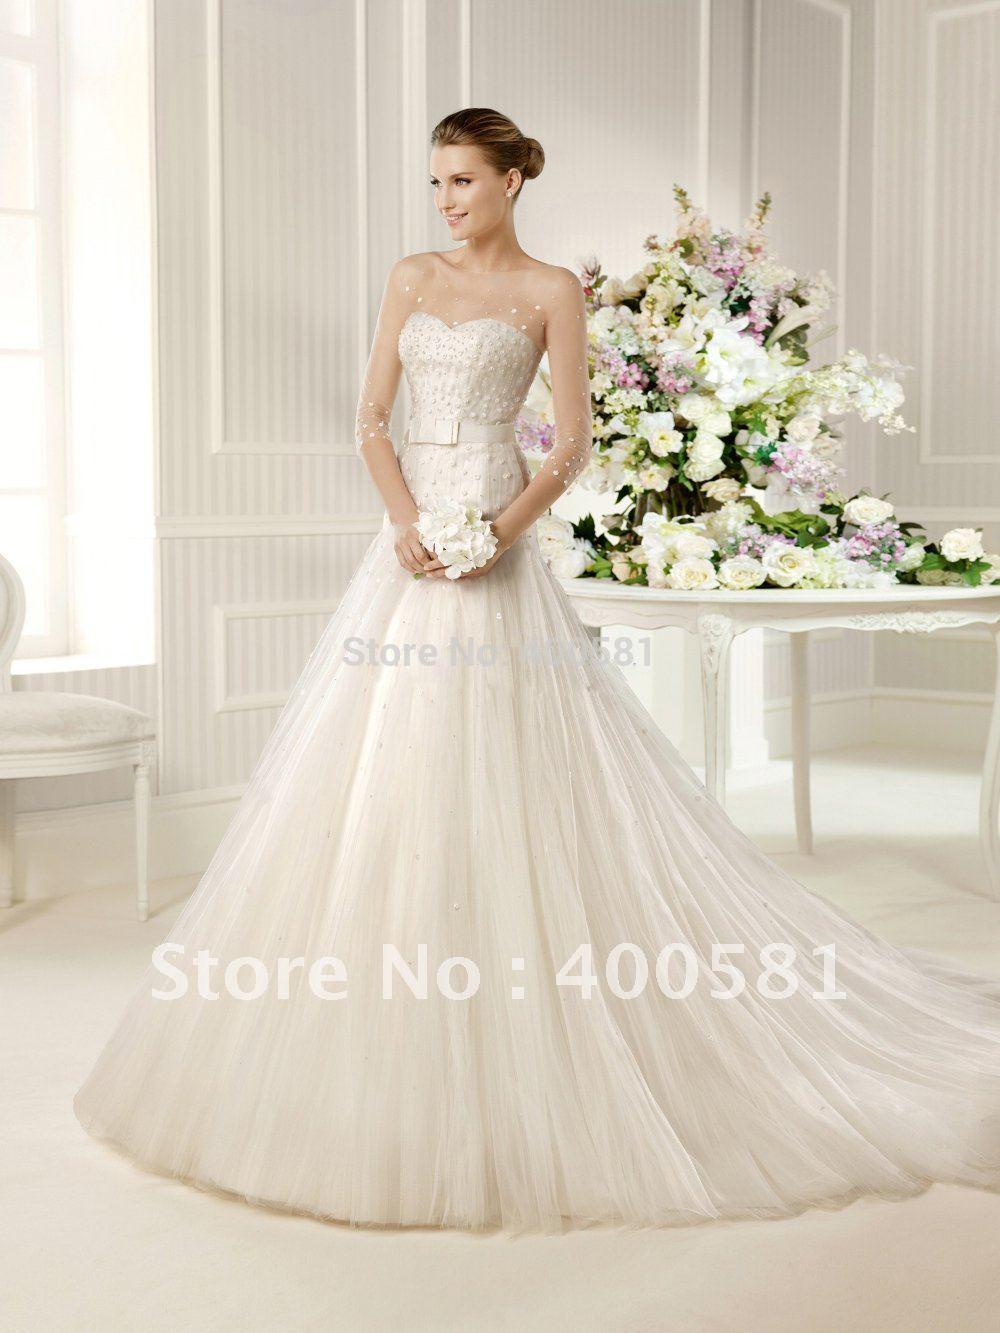 Displaying 16> Images For - Sheer Sleeve Wedding Dress...